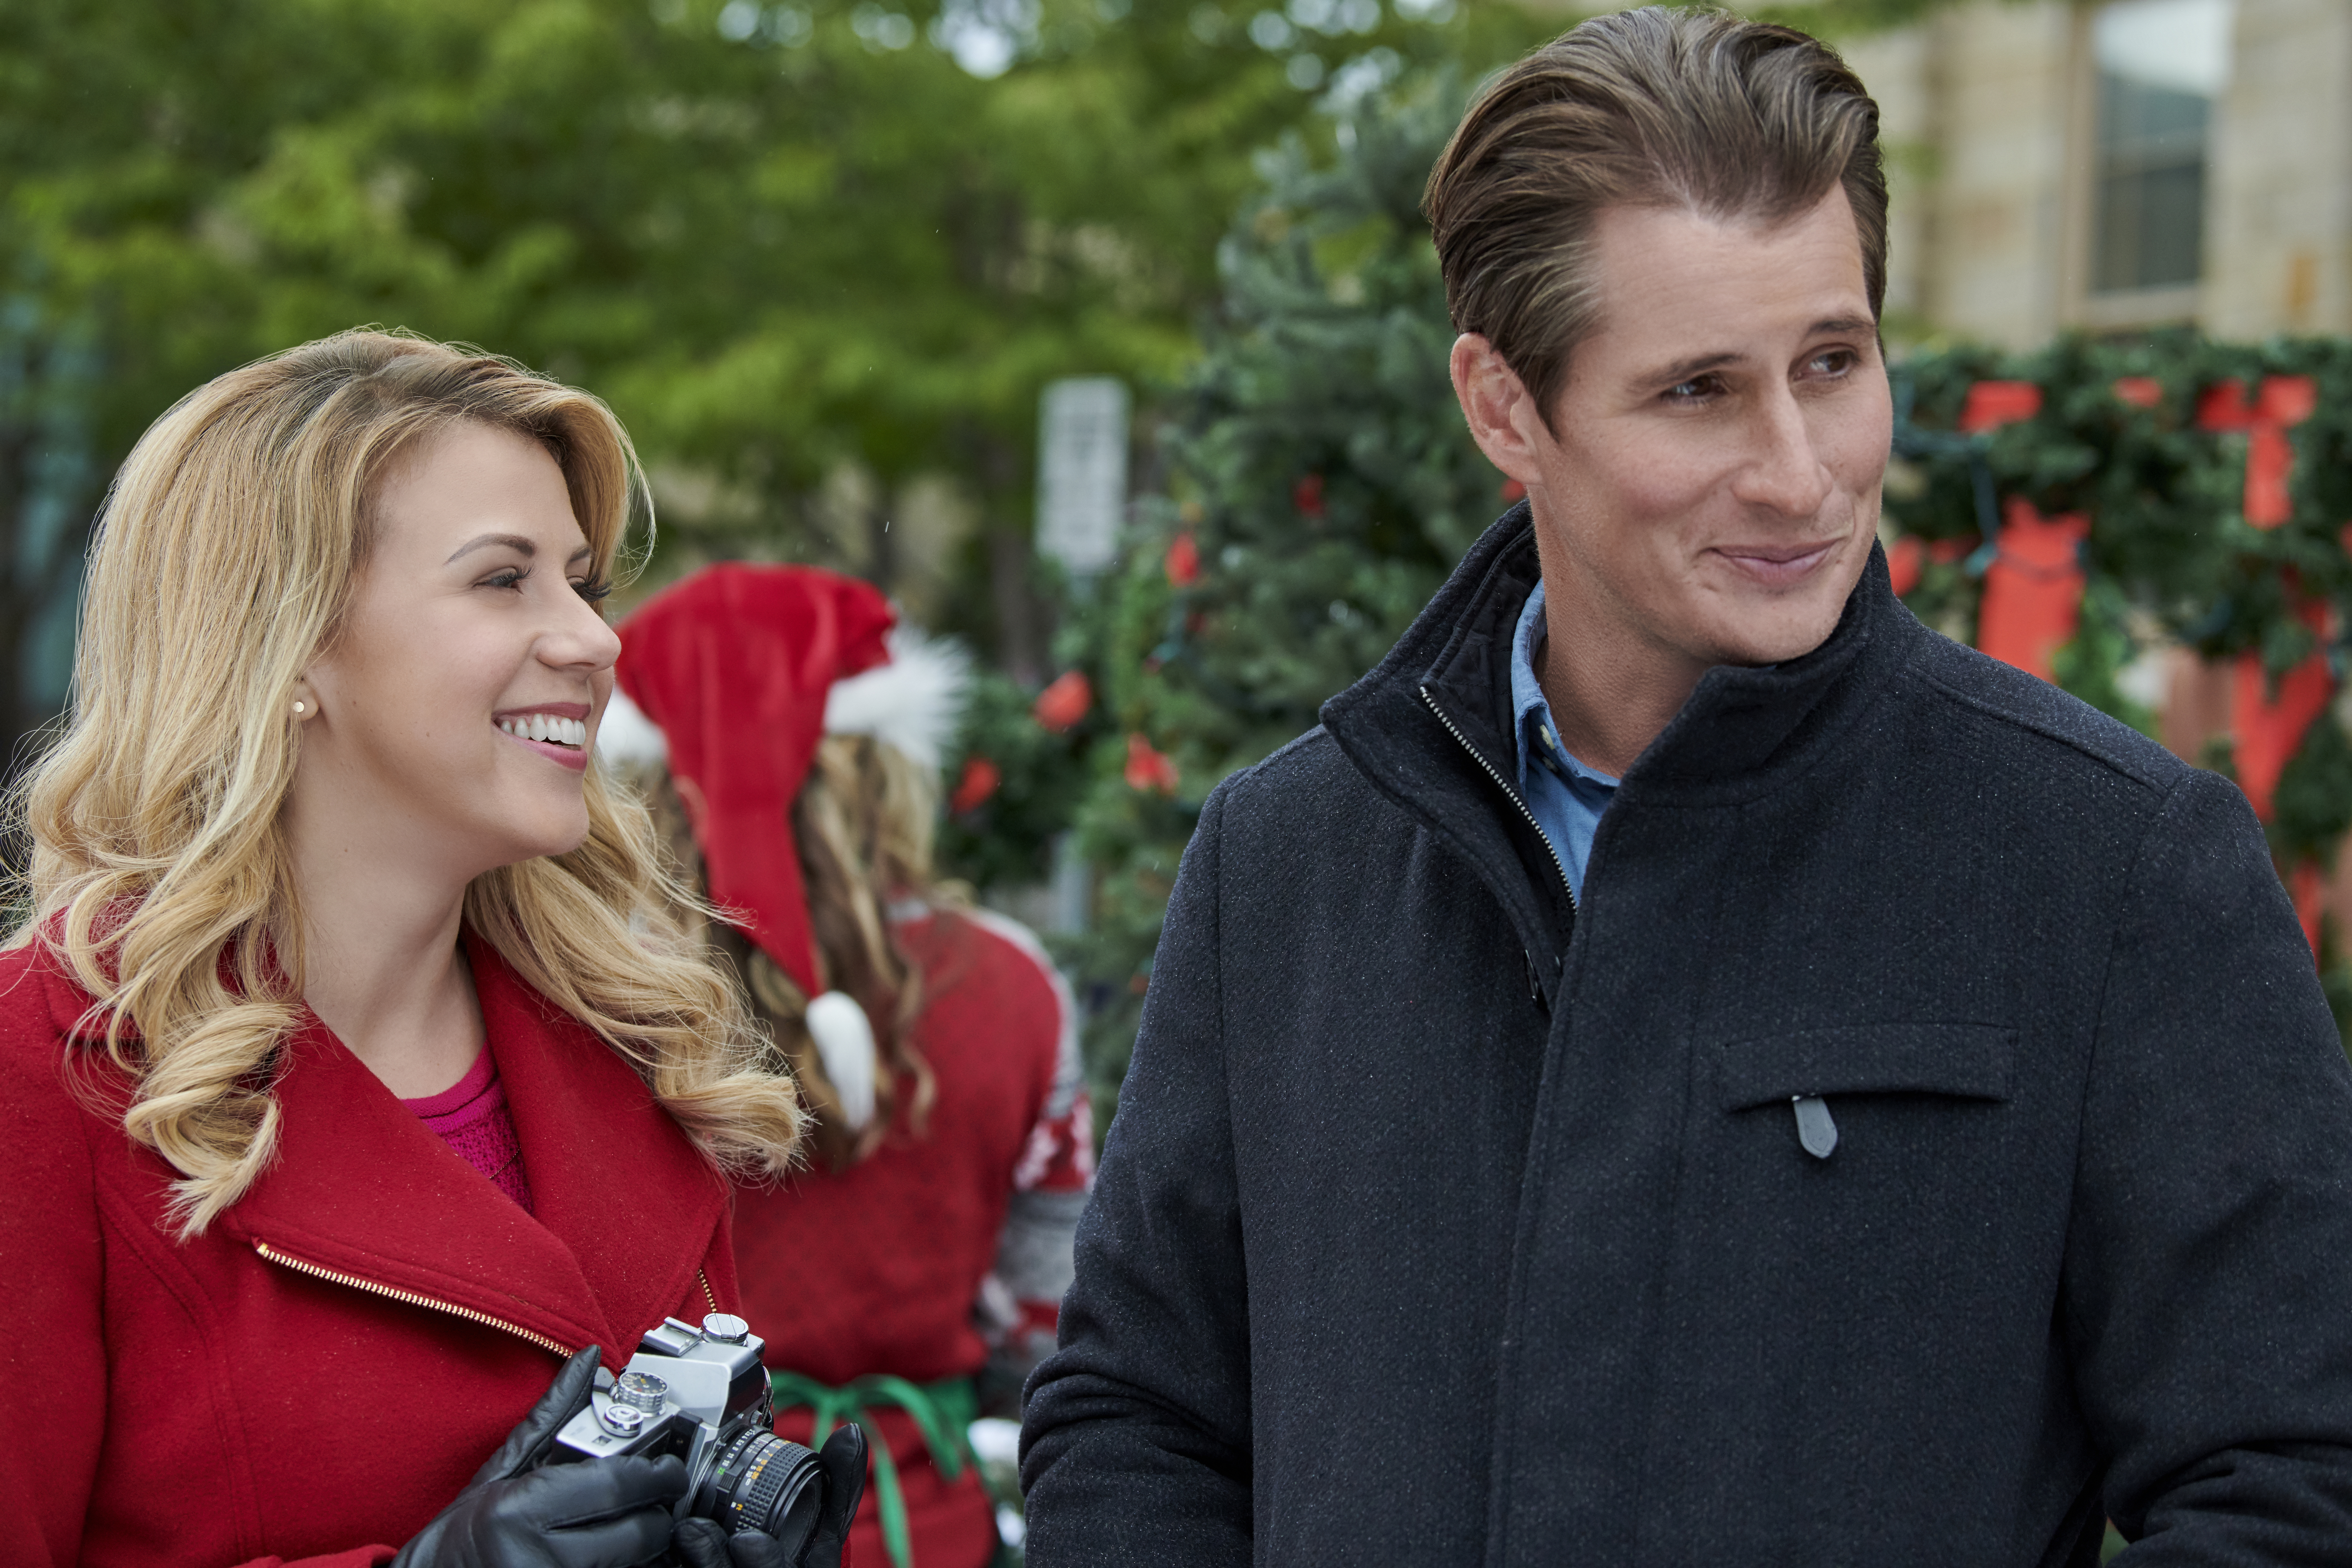 Cast of 'Entertaining Christmas'